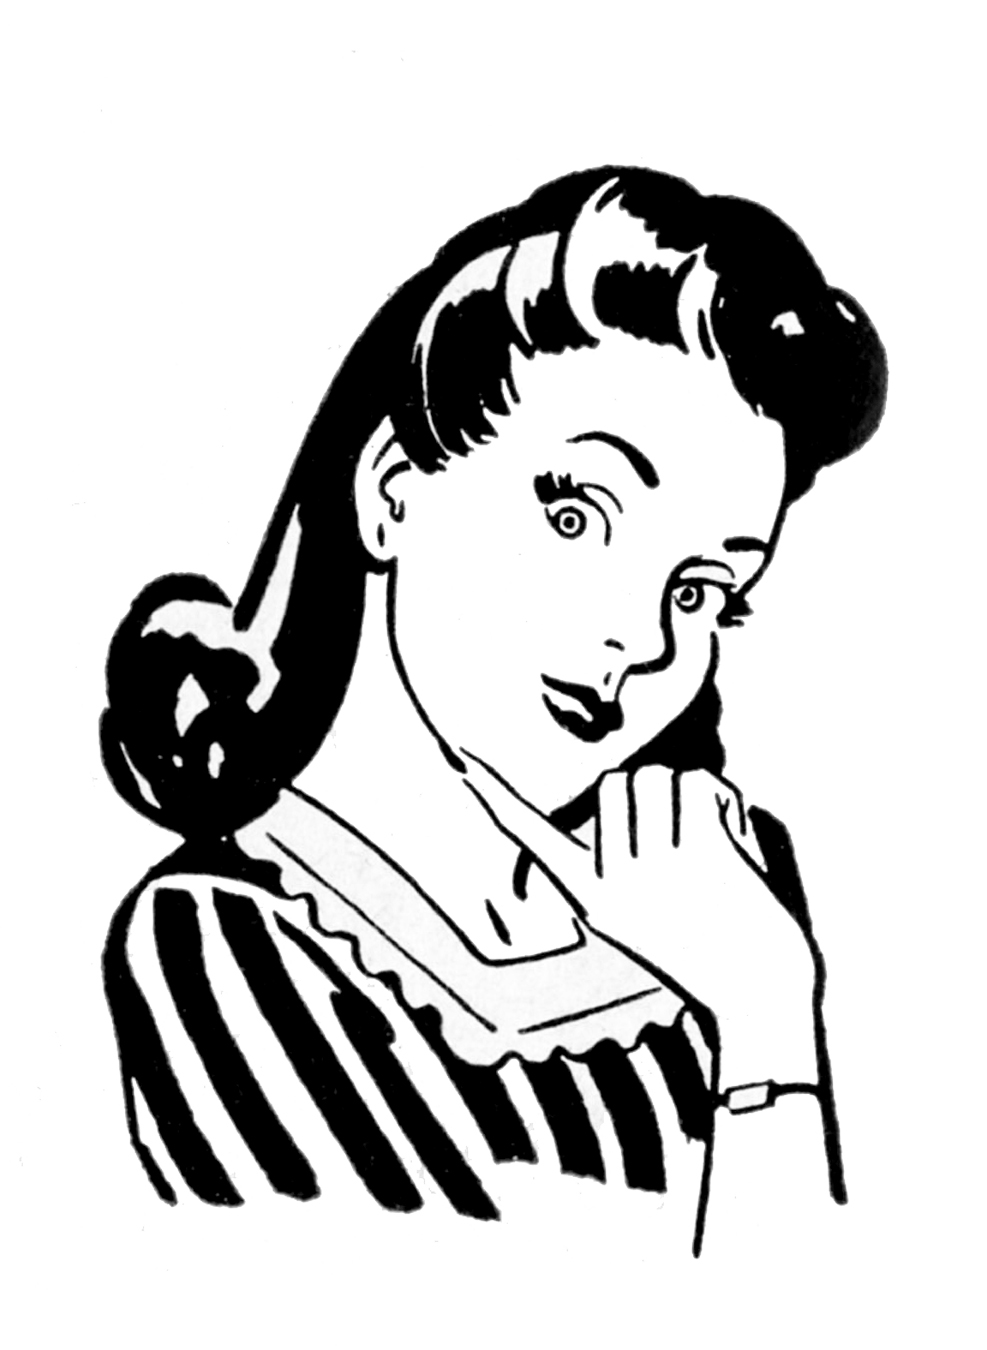 Graphics clipart graphic black and white Retro Clip Art - Quirky Women - The Graphics Fairy graphic black and white